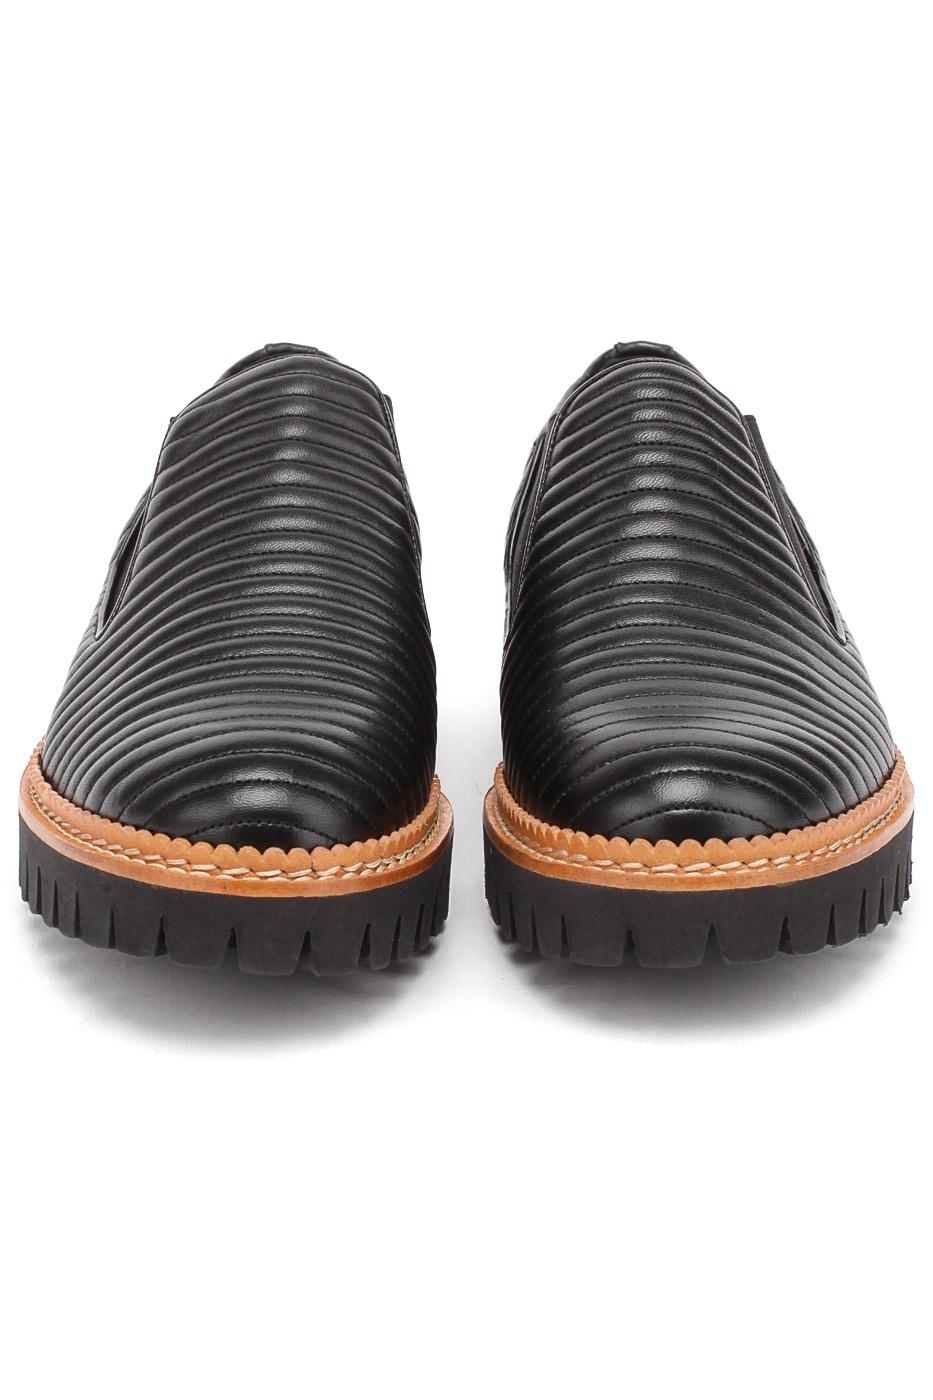 Ботинки испанского бренда Pertini 38 размера.